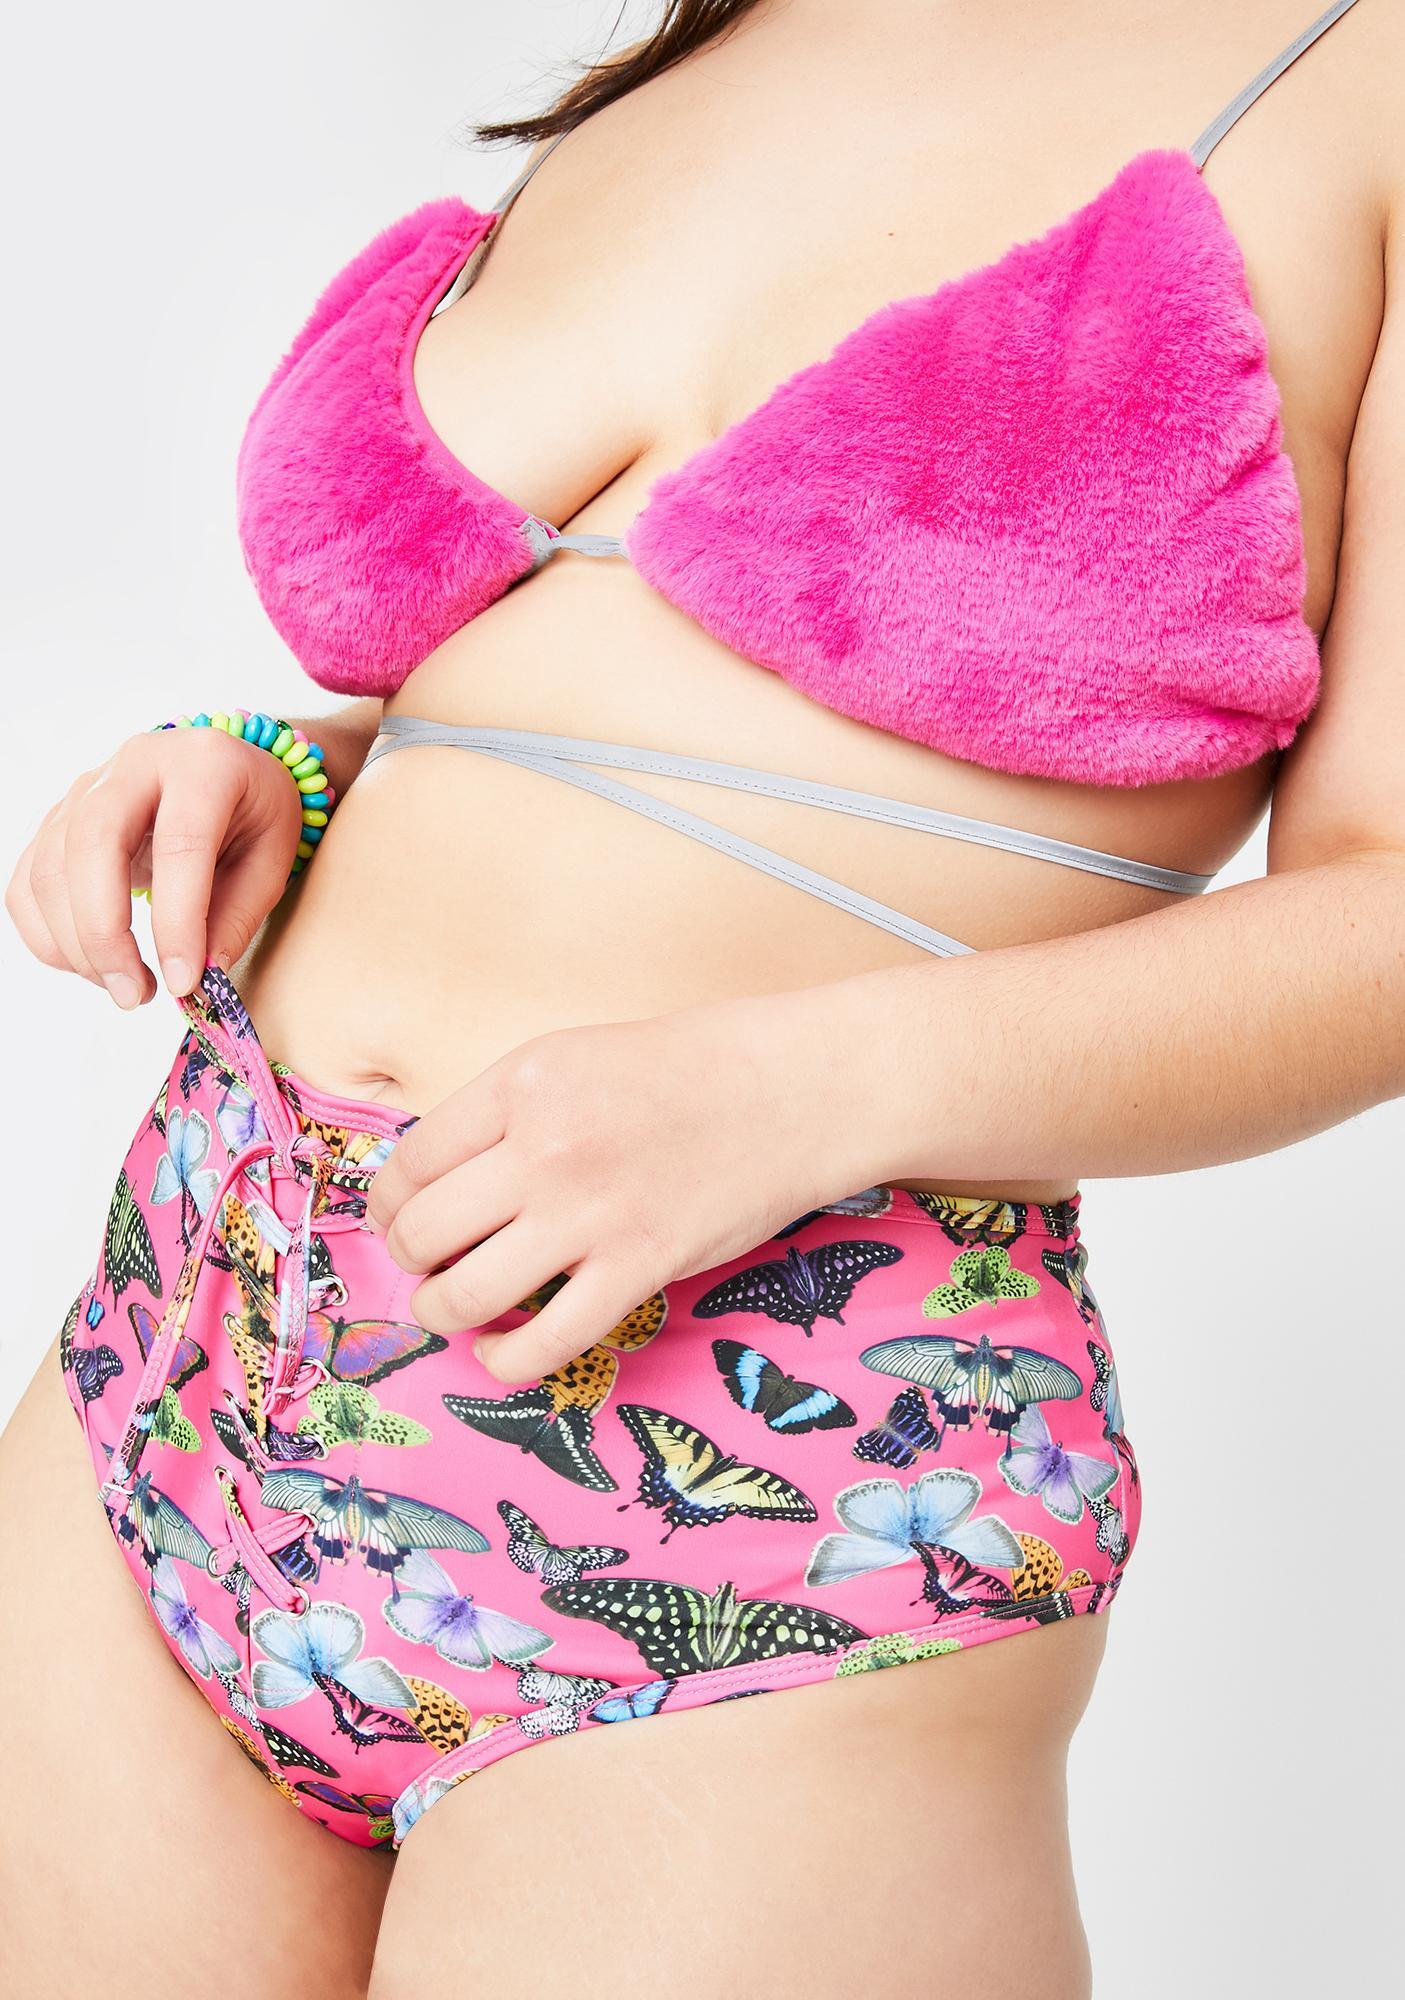 Club Exx True Lovebug Lace-Up Shorts